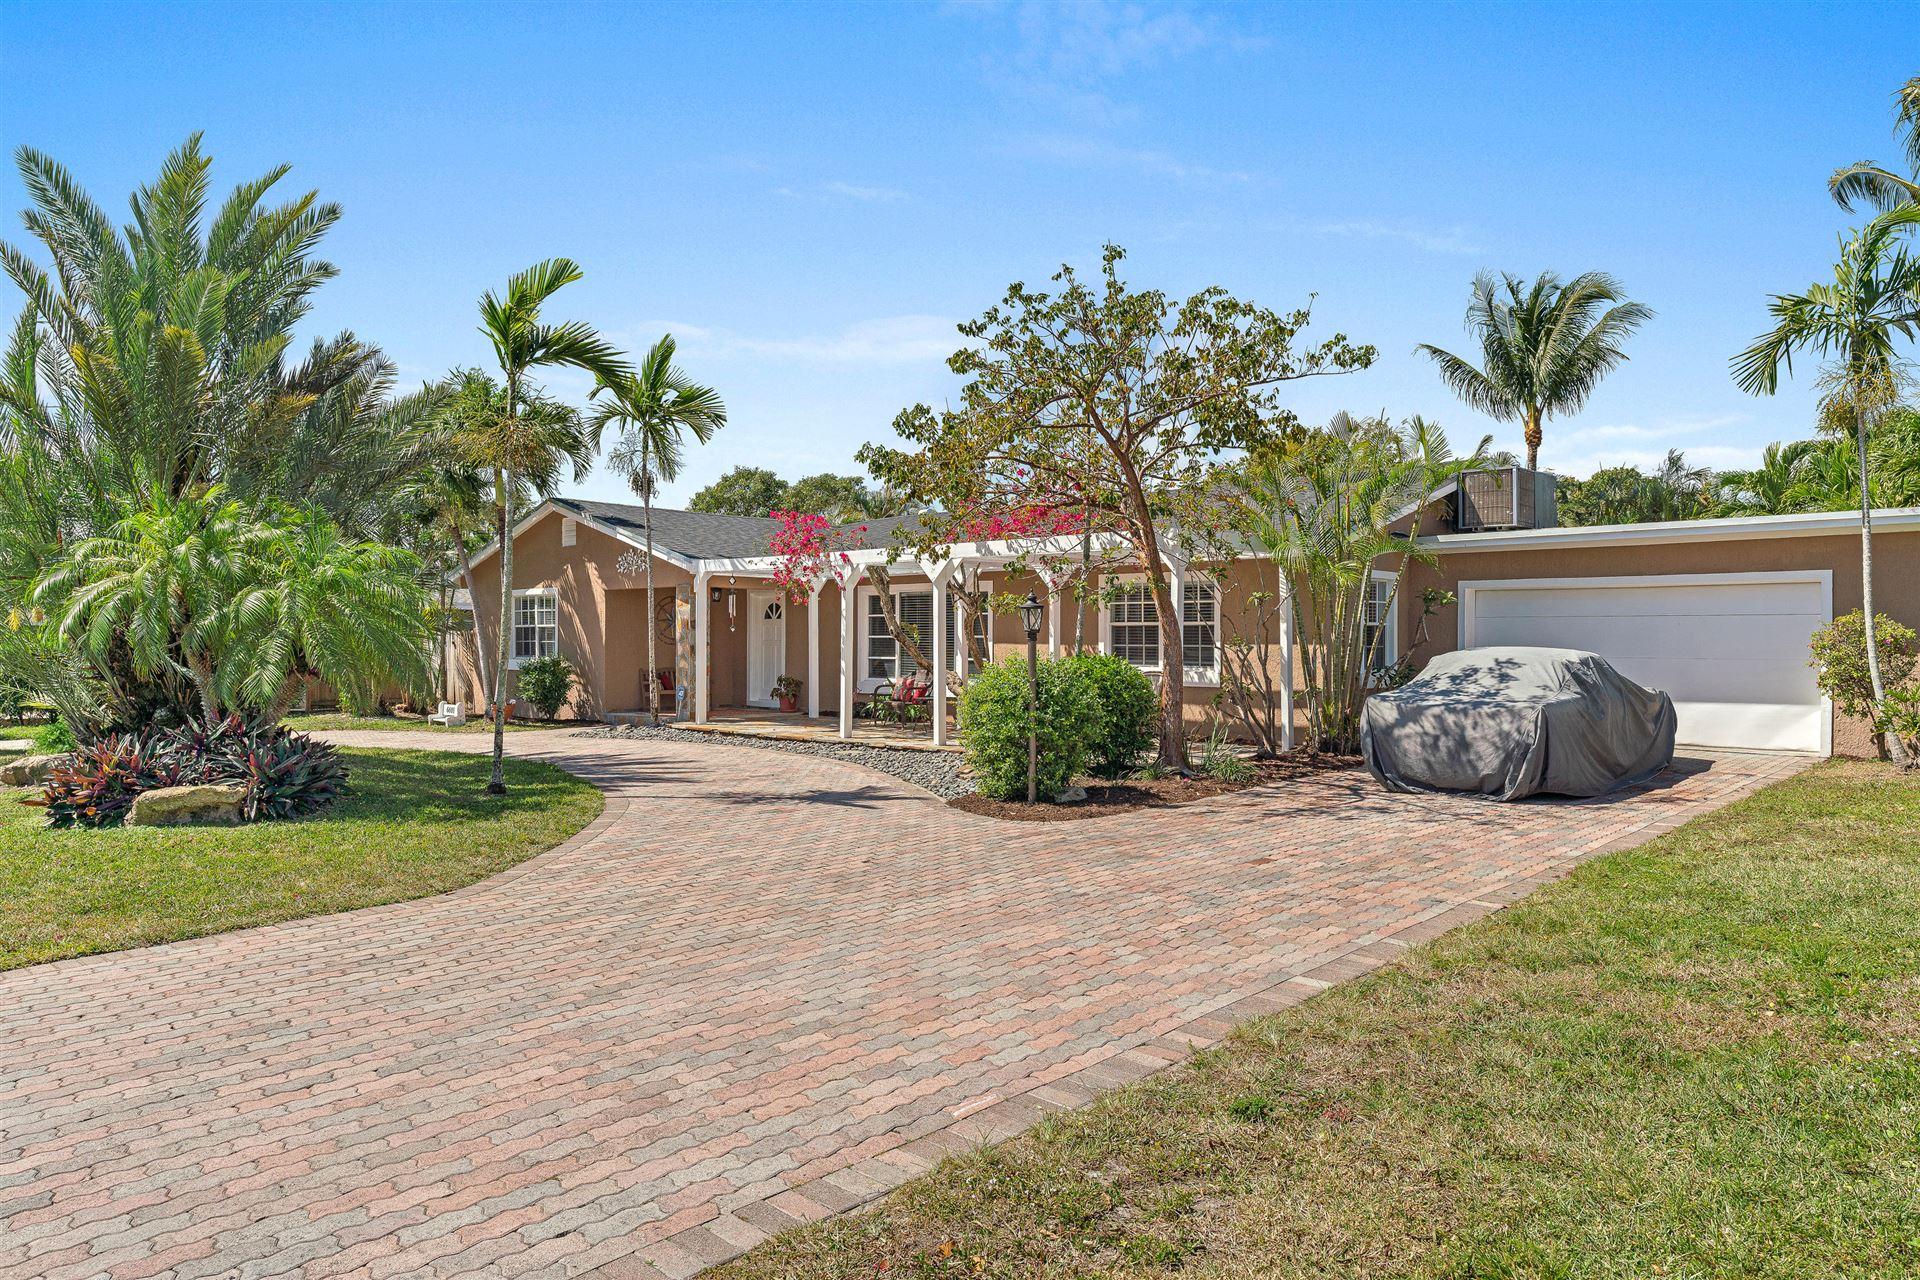 6601 Mango Circle, Lake Clarke Shores, FL 33406 - #: RX-10609611